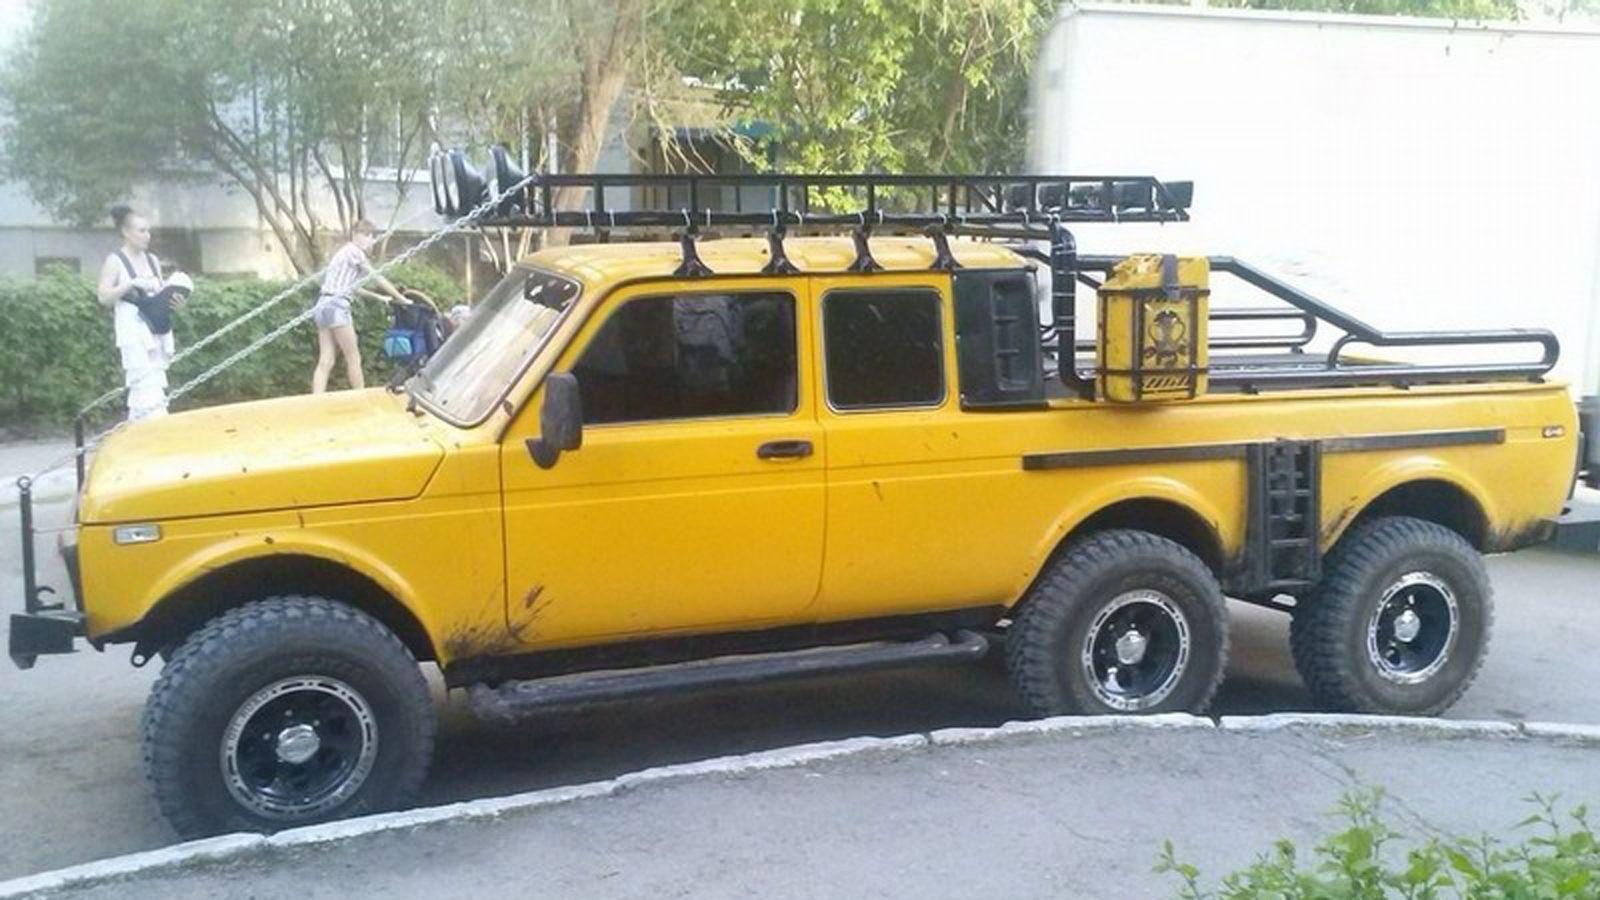 Lada Niva 6x6 Pick Up Lada Niva 4x4